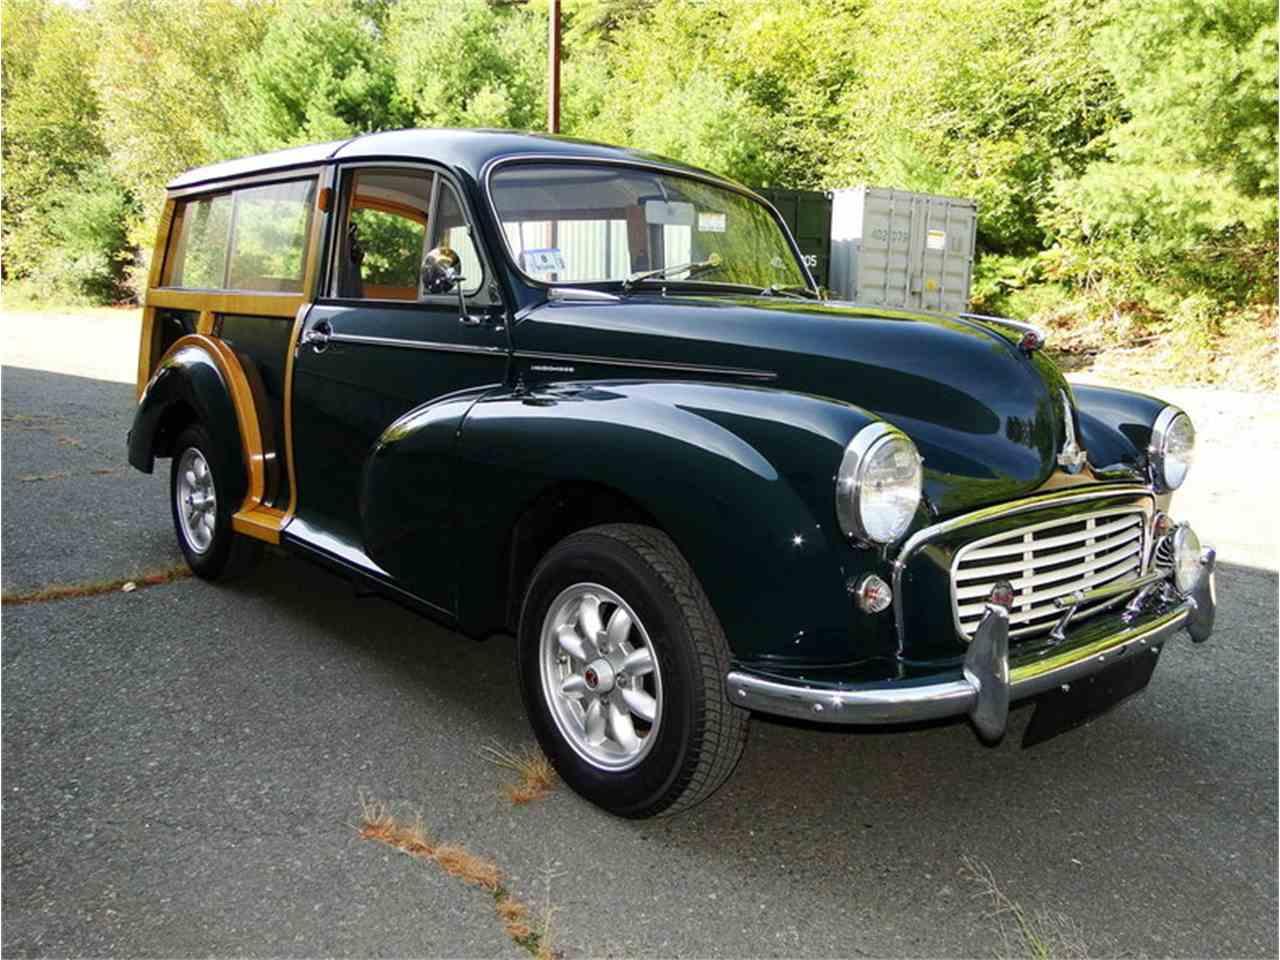 Morris minor traveller for sale - 1967 Morris Minor 1037773